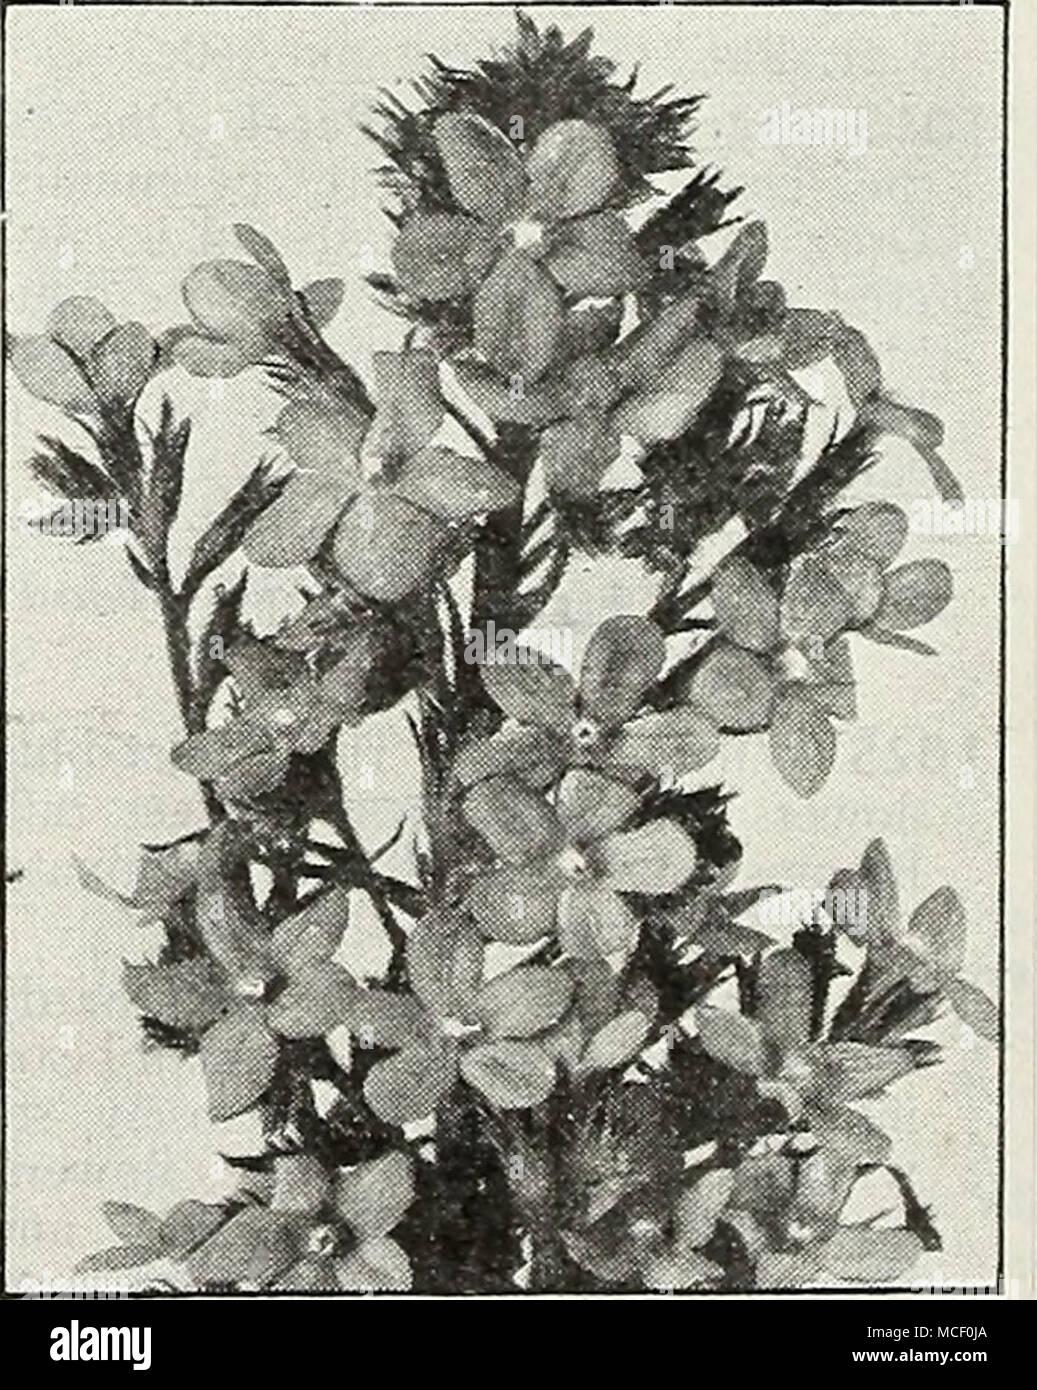 . Anchusa italica grandiflora. Opal 38 ®=Annual; (B)=Biennial; [HHp]=Half-Hardy Perennial; [HP]=Hardy Perennial; [Tp]=Tender Perennial - Stock Image